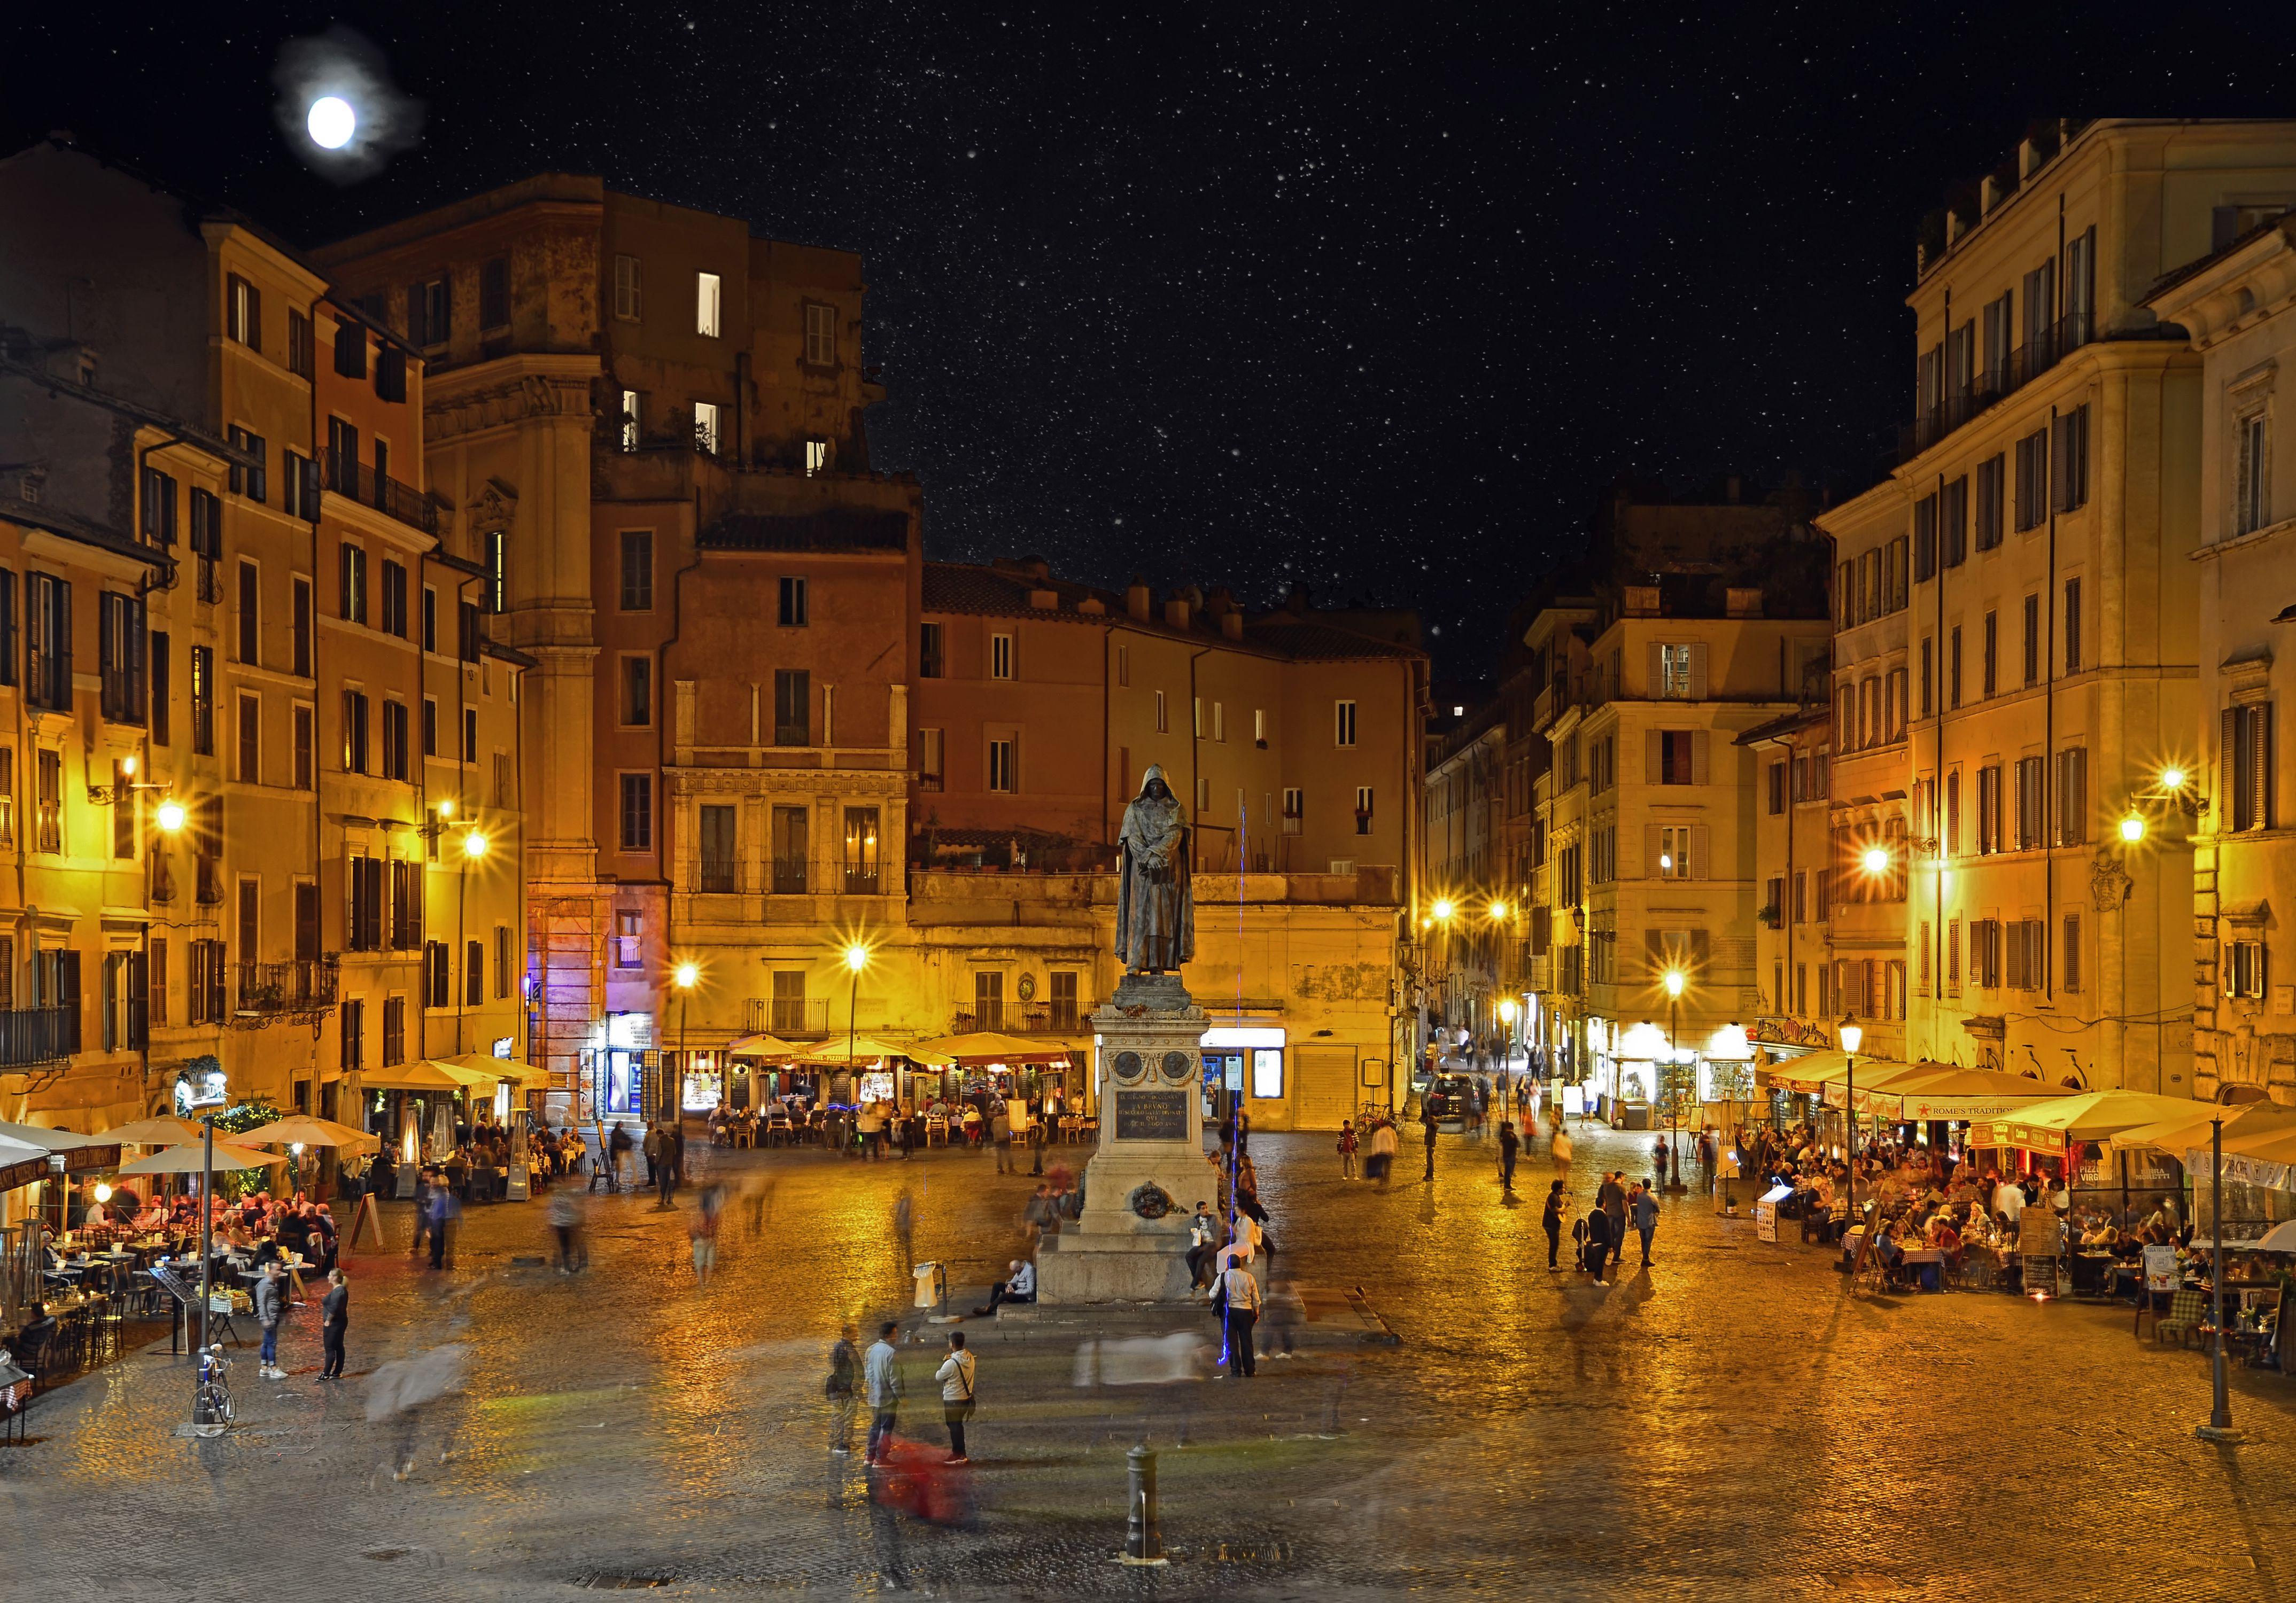 Campo dei Fiori at night with the monument to philosopher Giordano Brvno